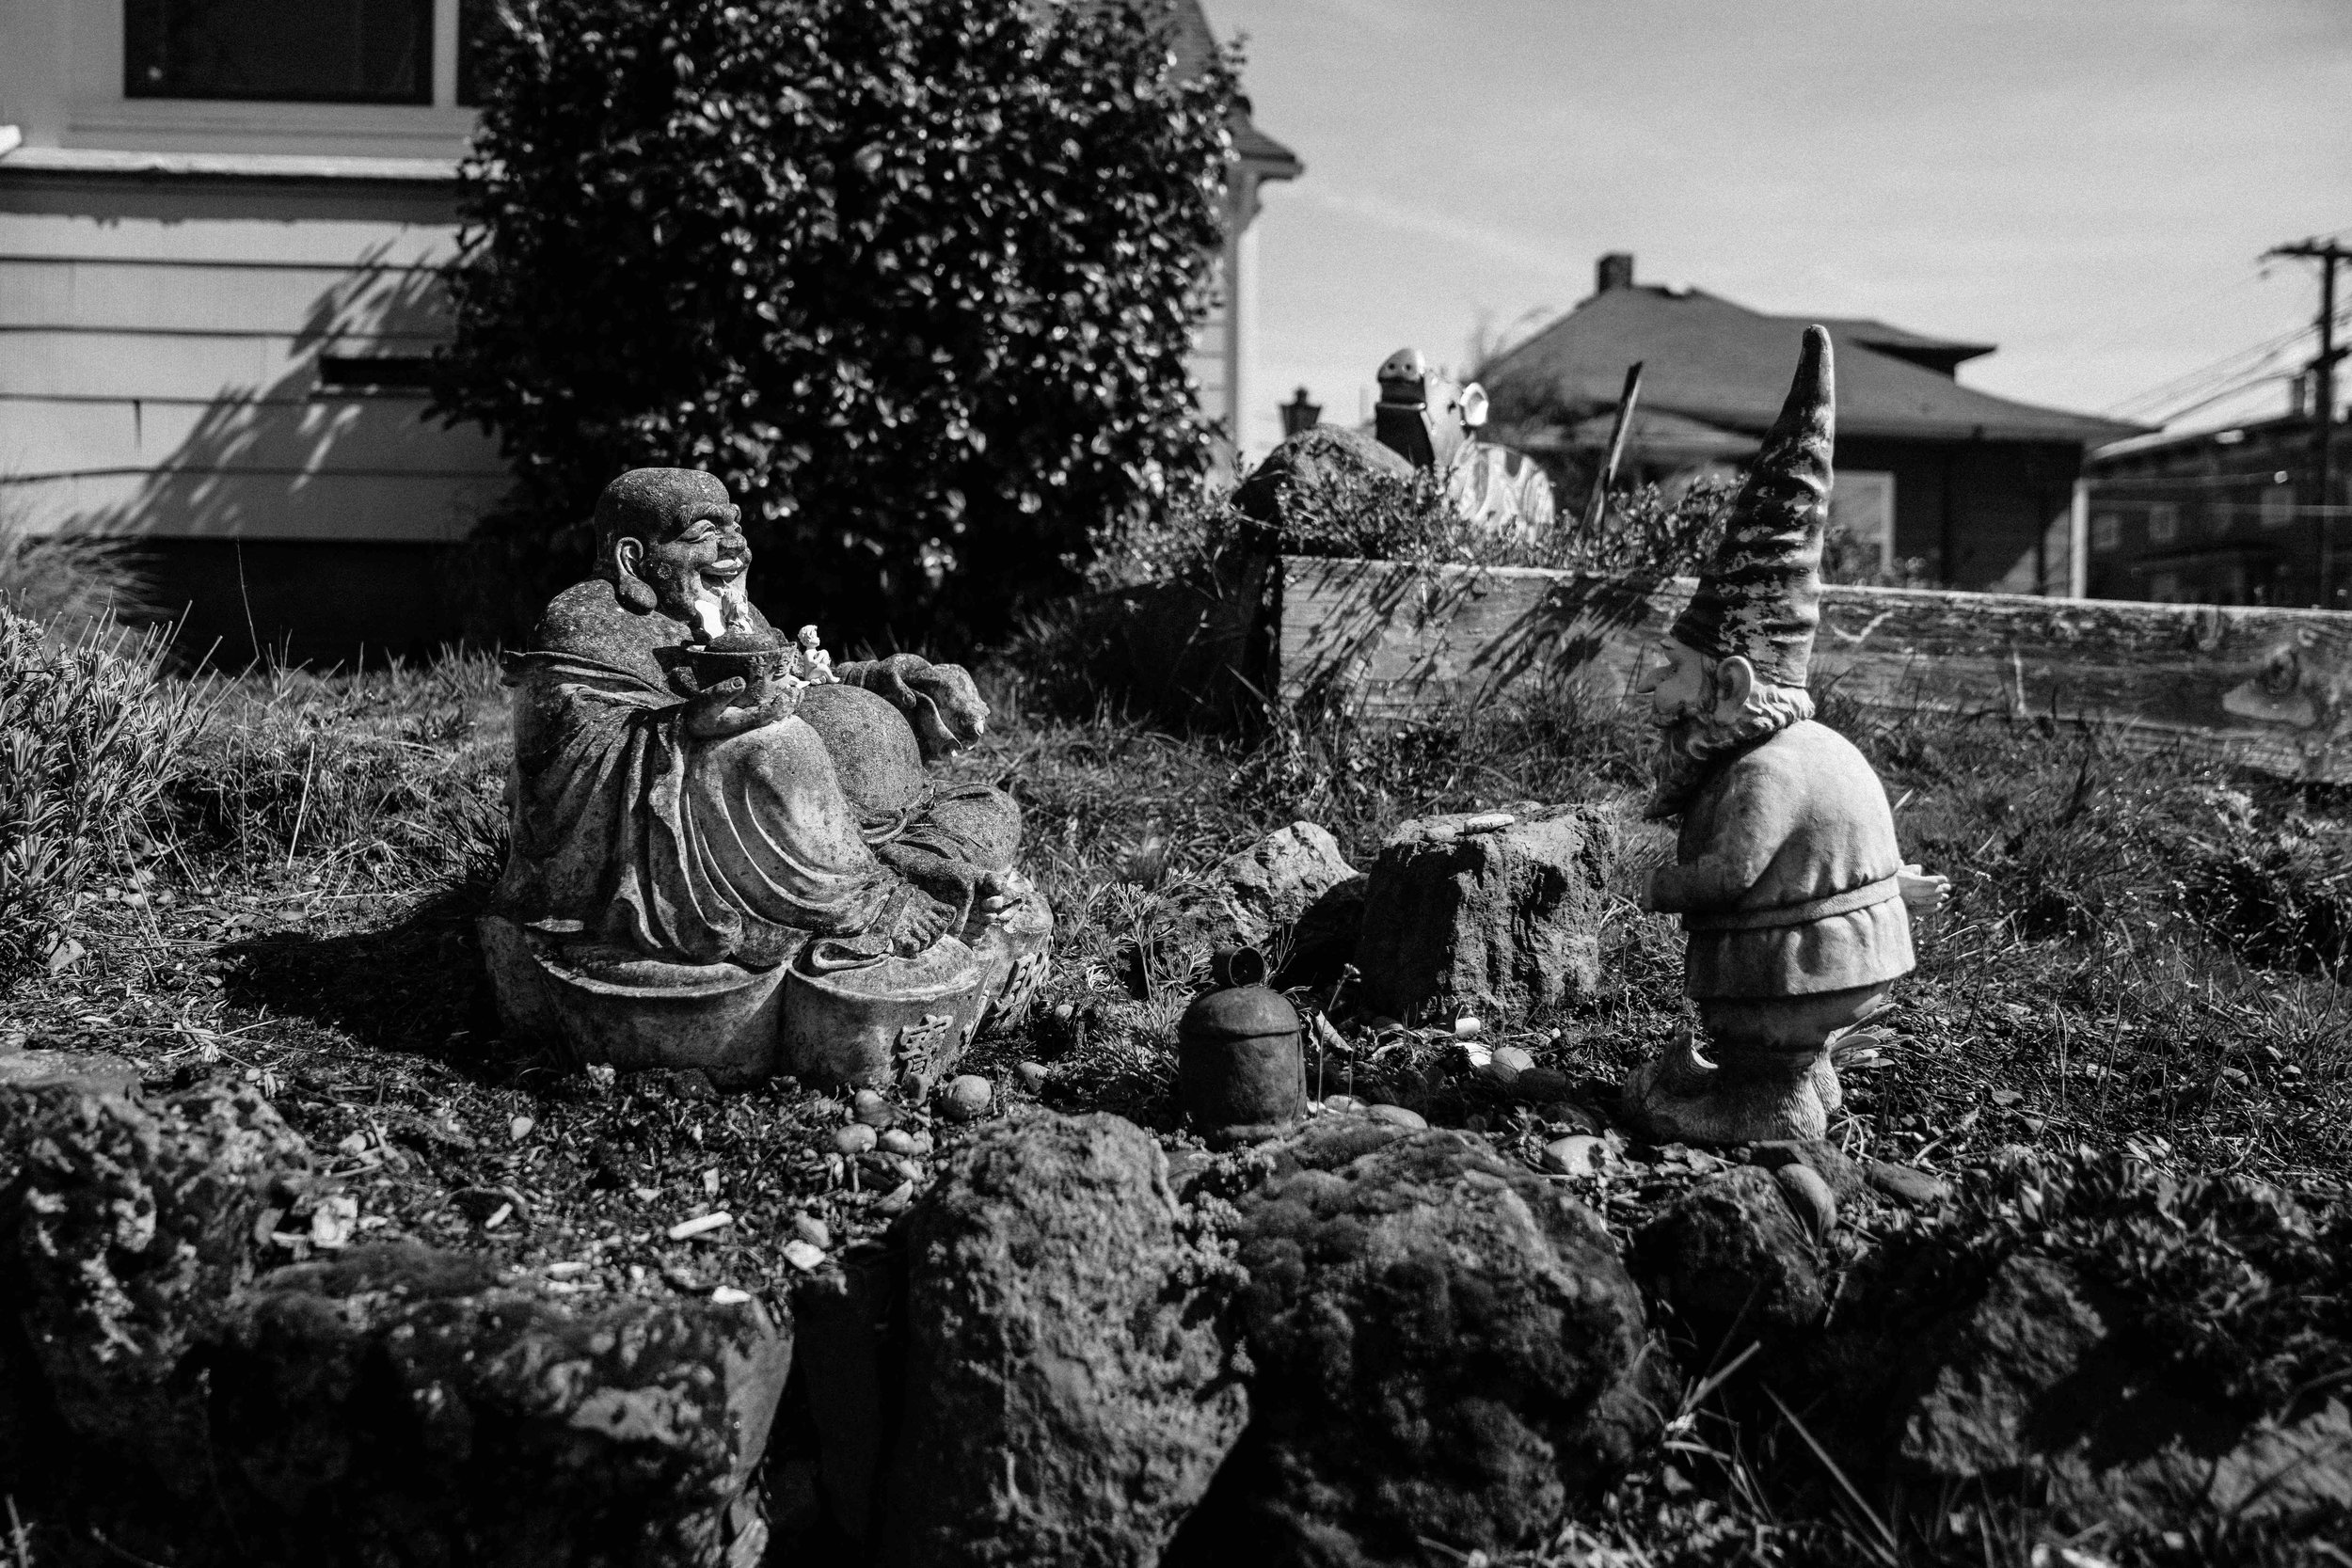 josue-rivas-portland-oregon-culture-crush-gnomes-buddha.jpg